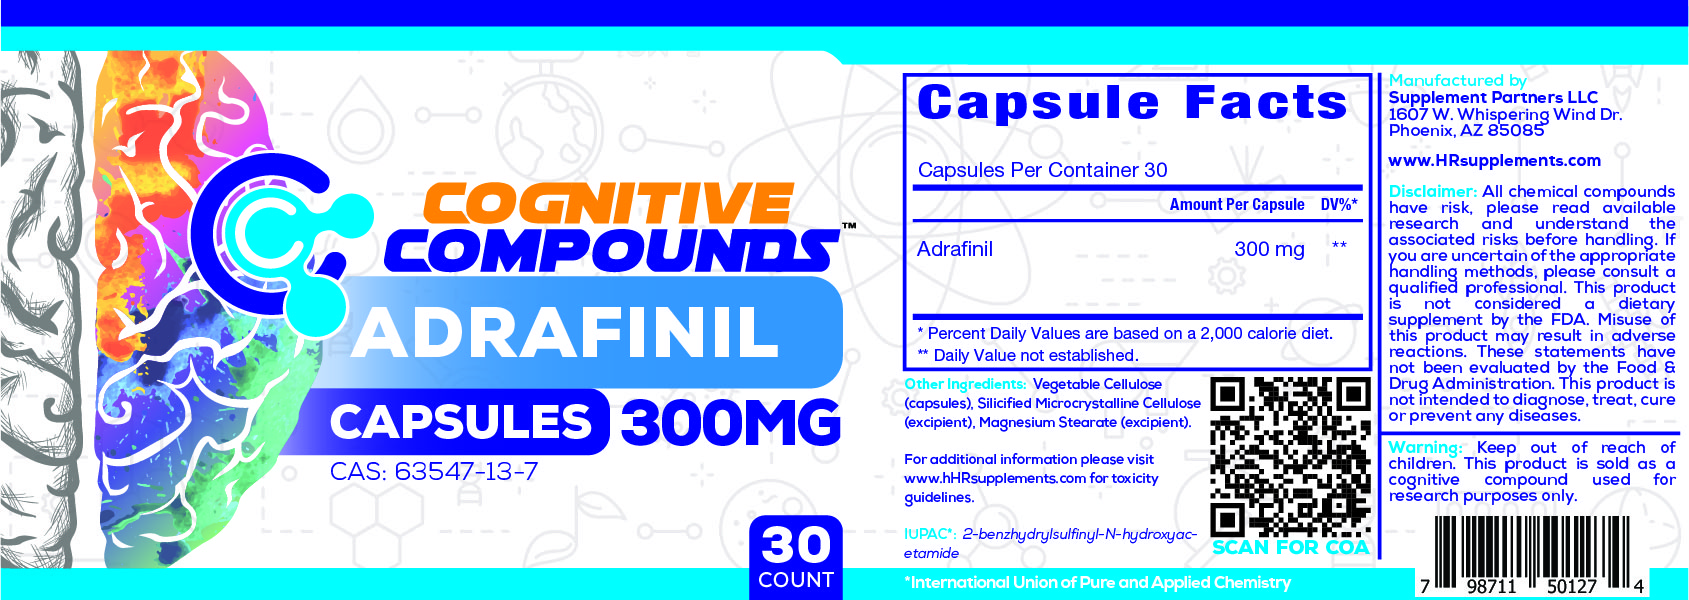 adrafinil-30-count.jpg